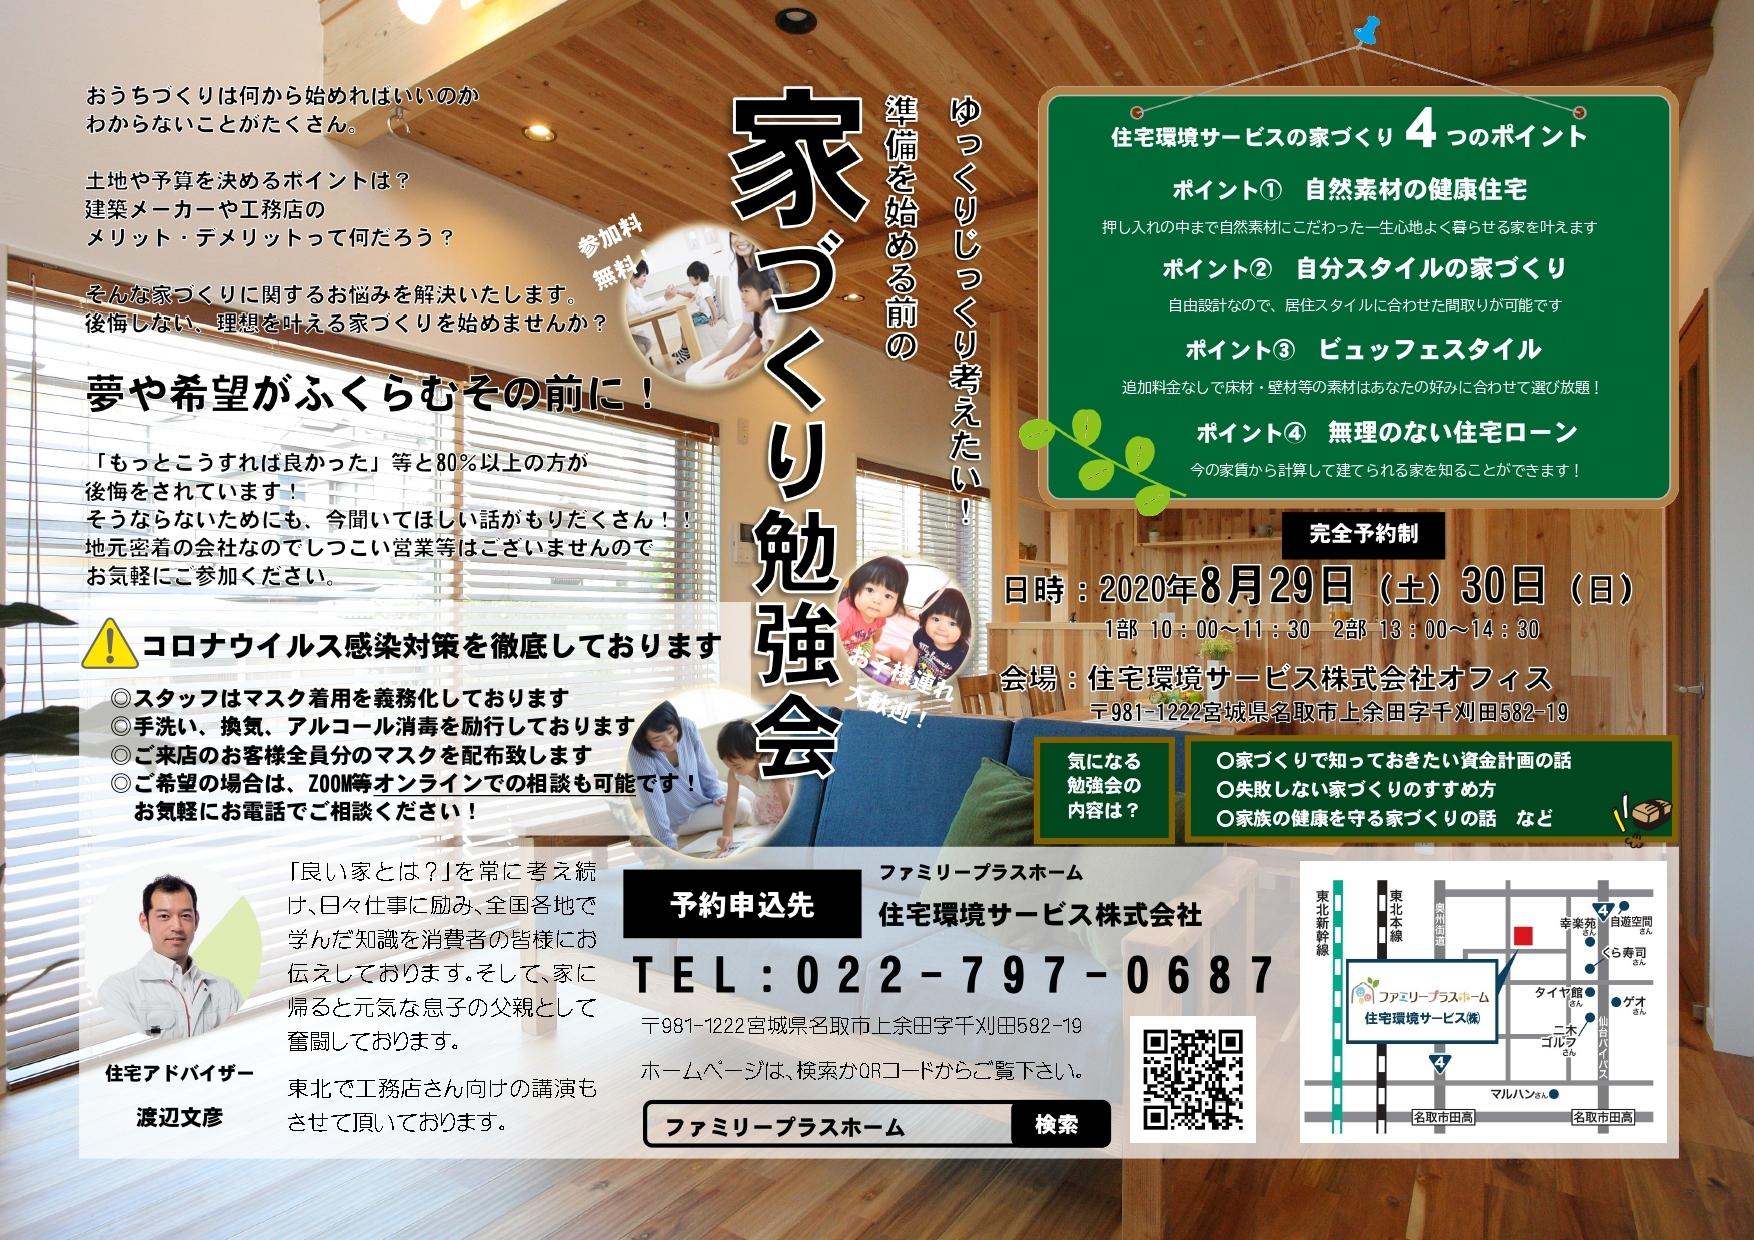 http://www.jutakukankyo-service.jp/c13a25eb65e84e4efb435d949dc34b107ab1274c.jpg